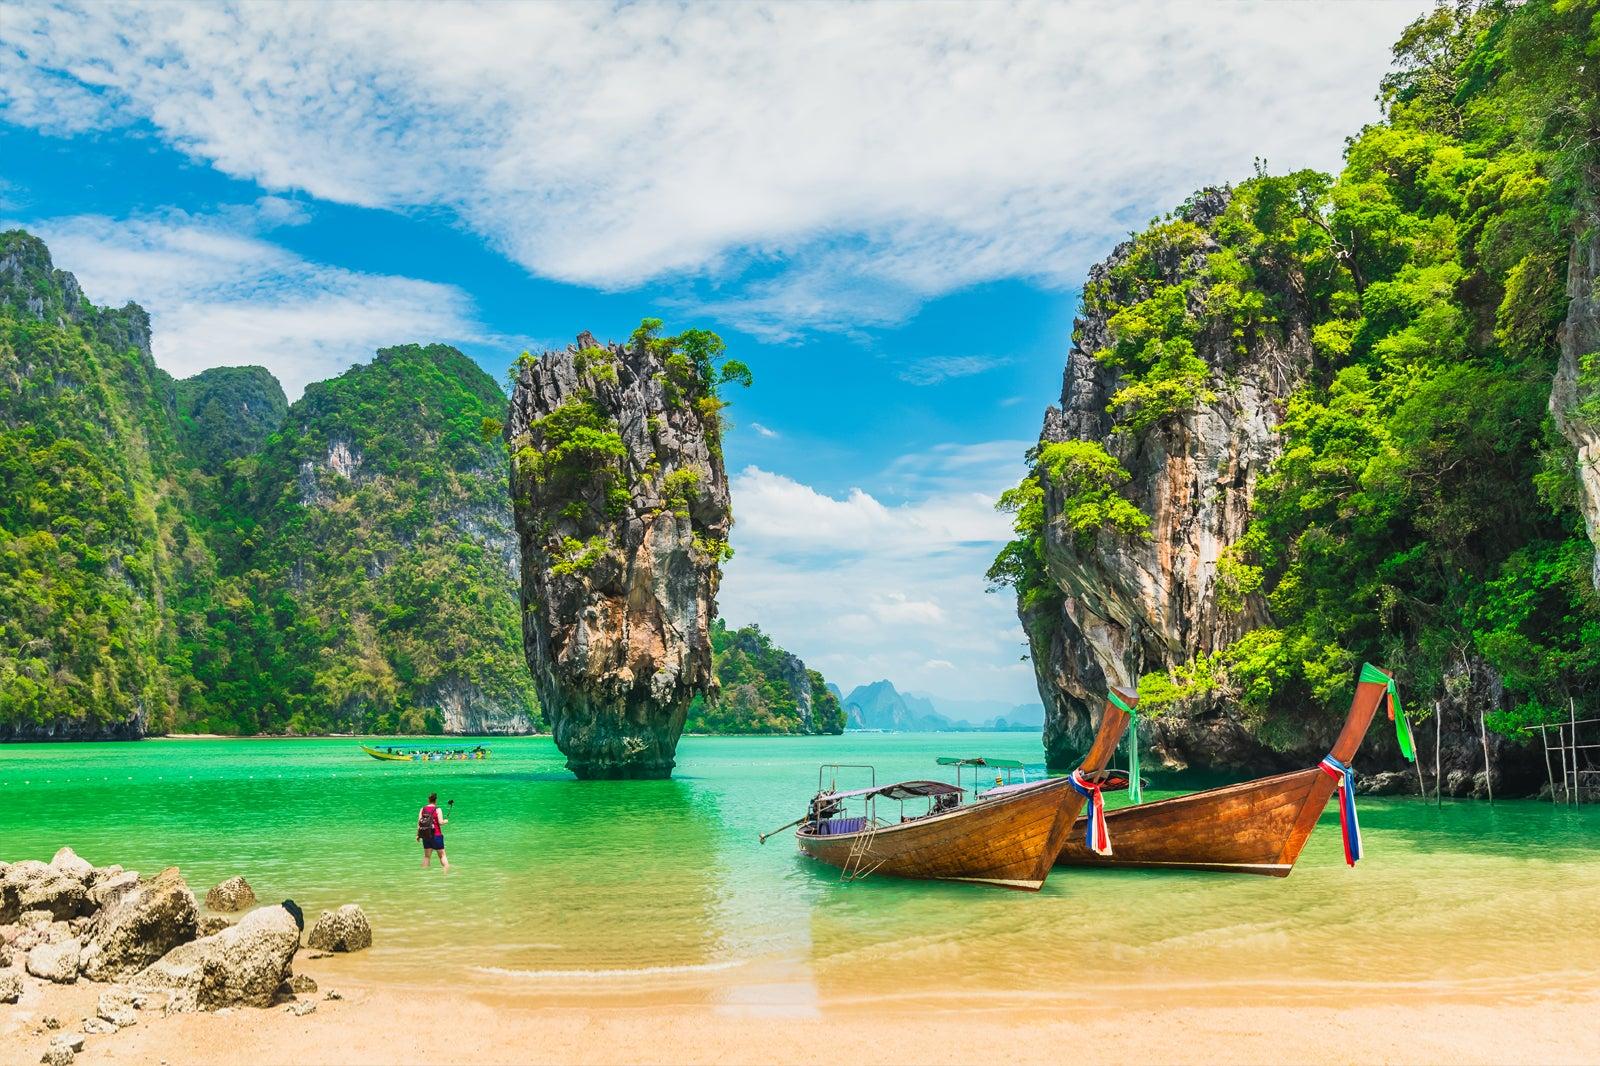 unique places to visit in Thailand